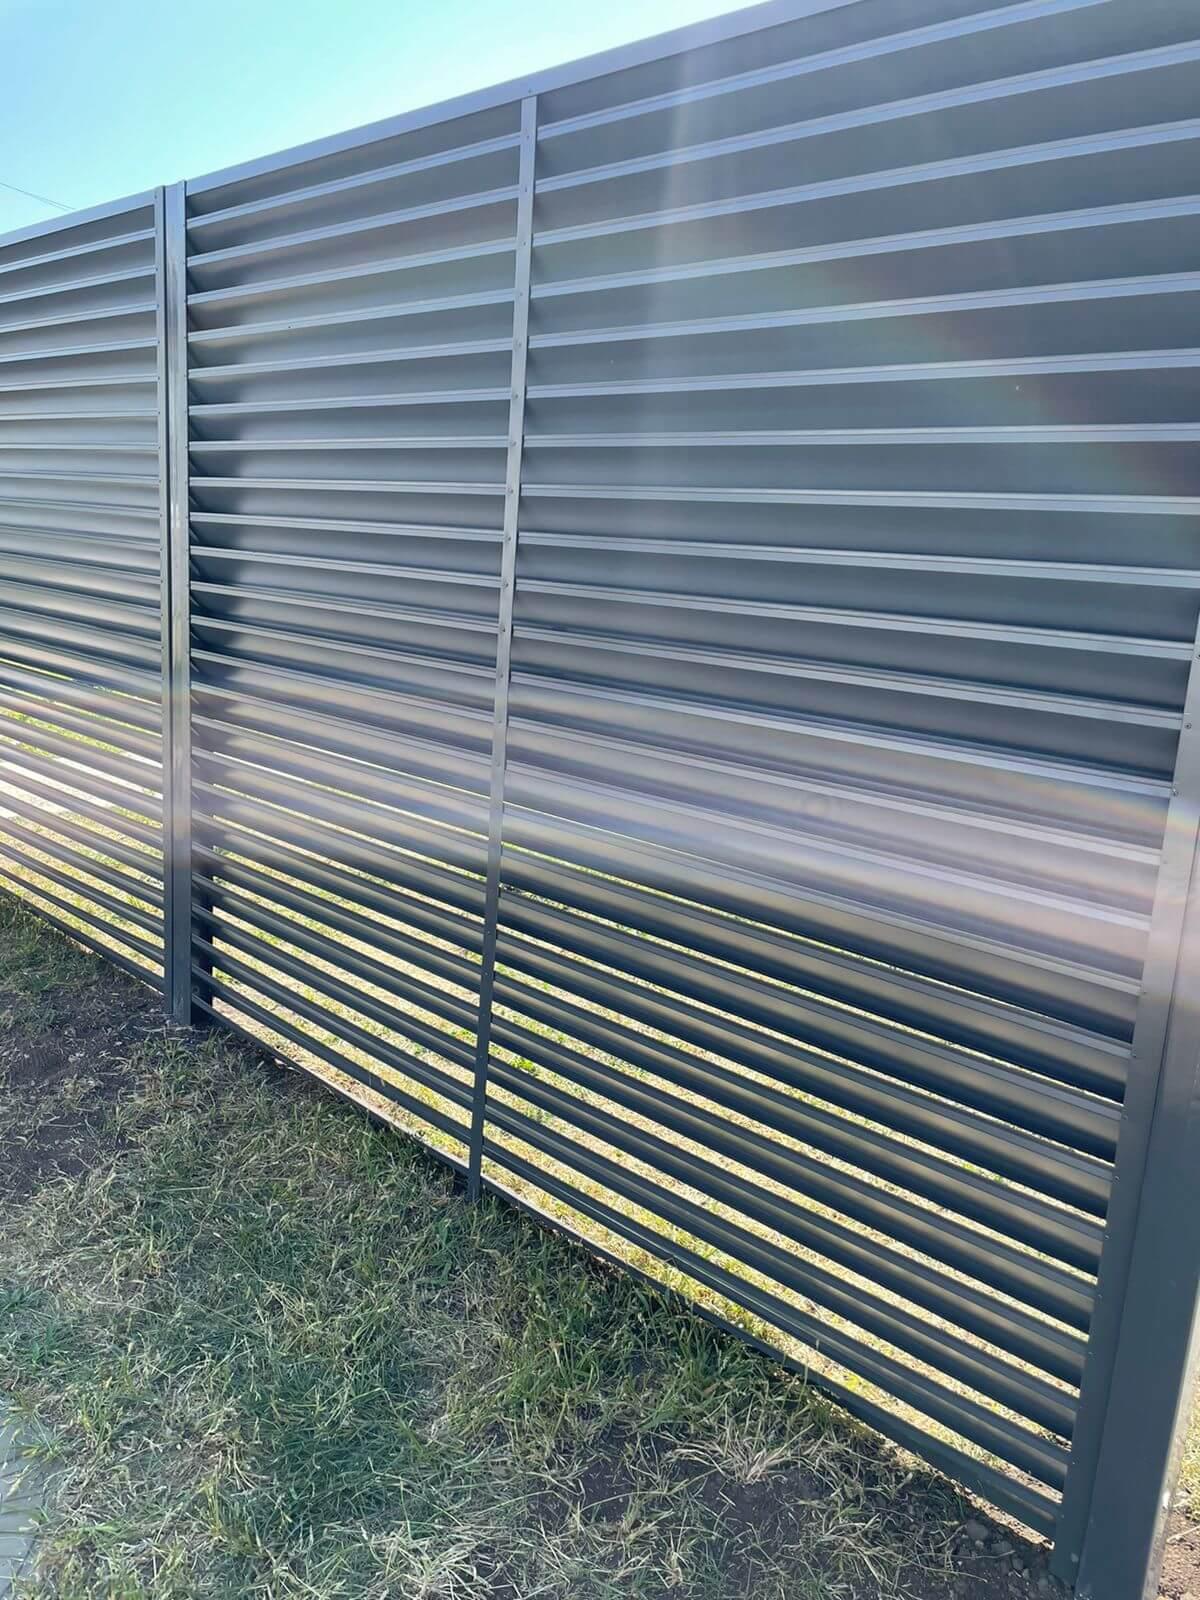 забор-жалюзи с ламелями эко-z ral7024/7024 серый графит двухсторонний фото1